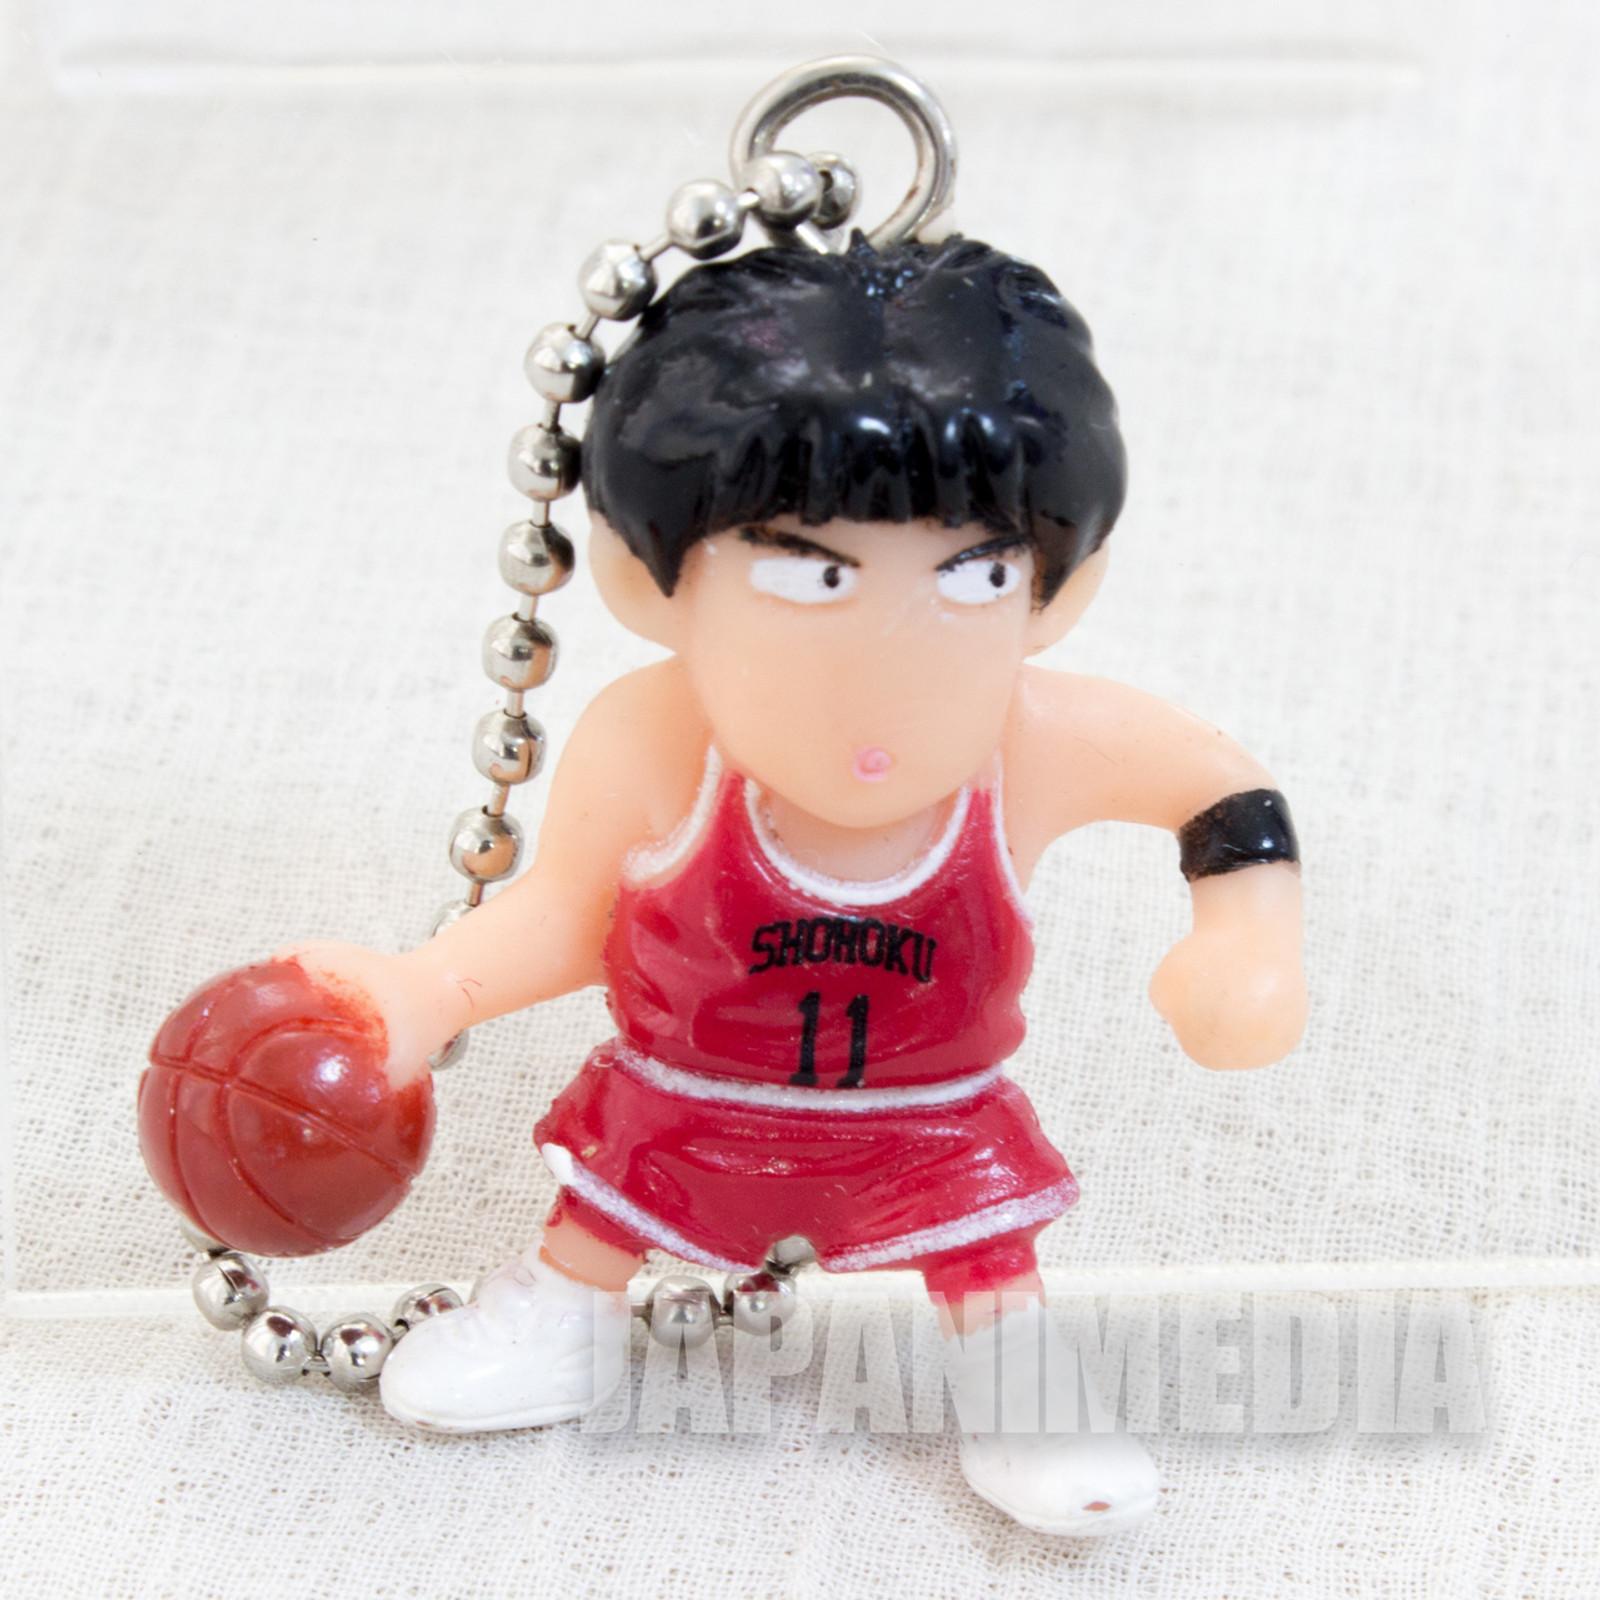 SLAM DUNK Kaede Rukawa Mini Figure Ball Key Chain JAPAN ANIME MANGA 1